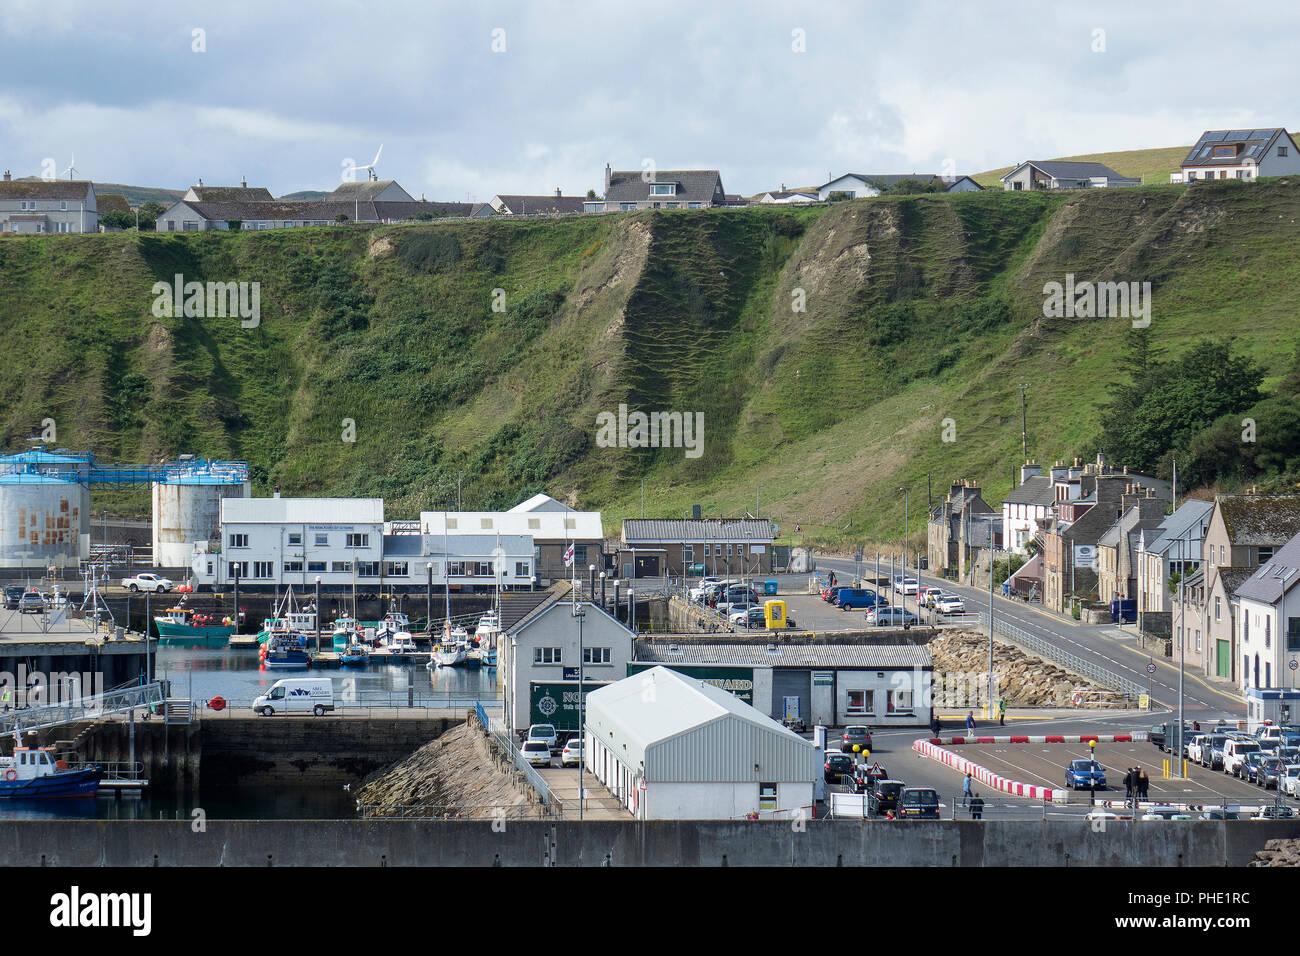 Scotland, Highlands, Caithness, Scrabster harbour - Stock Image